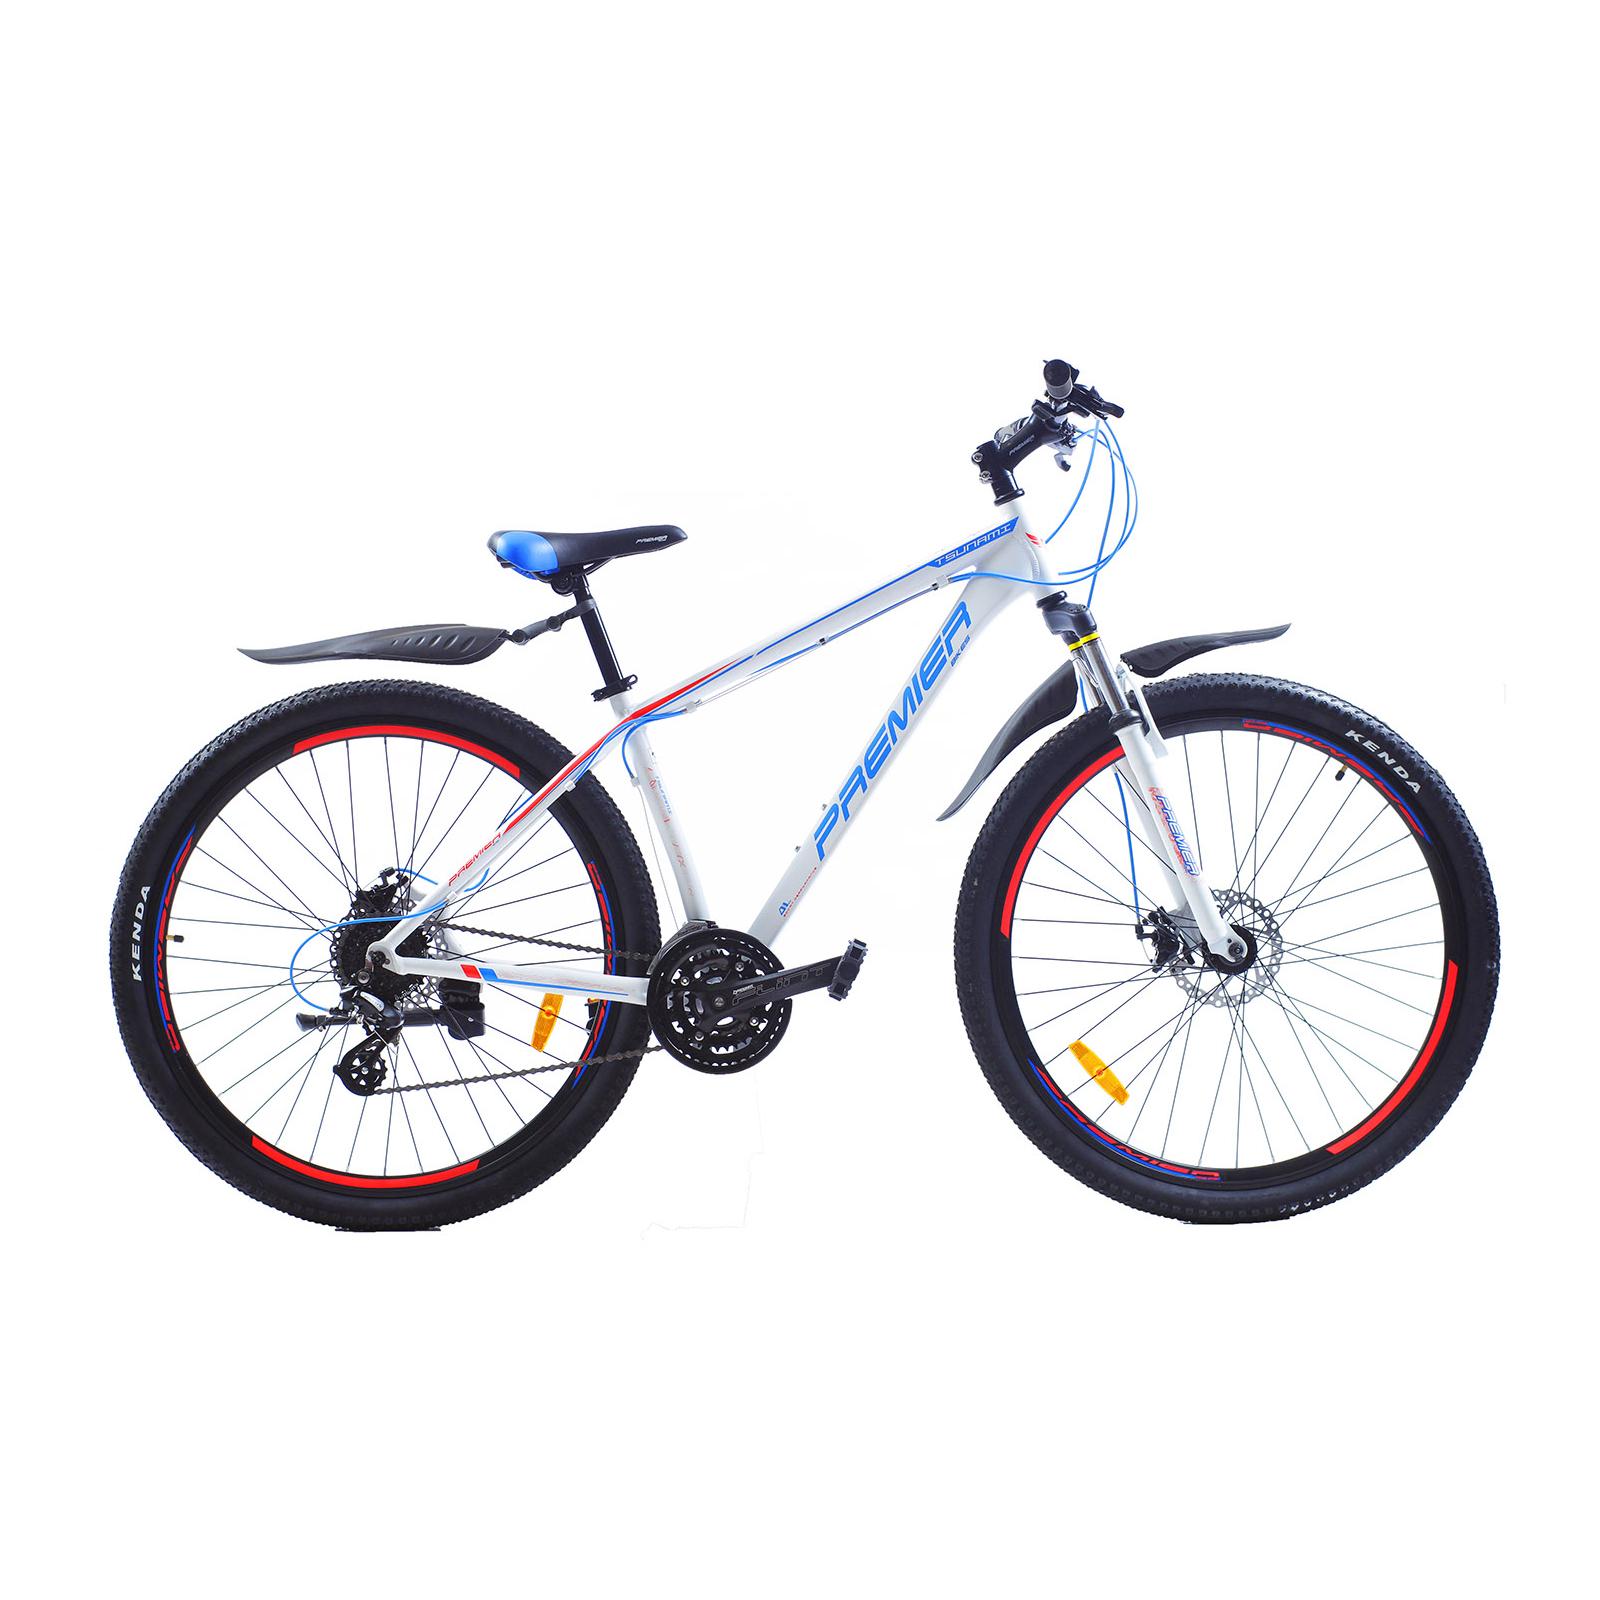 "Велосипед Premier Tsunami 29 Disc 17"" matt white (SP0001503)"